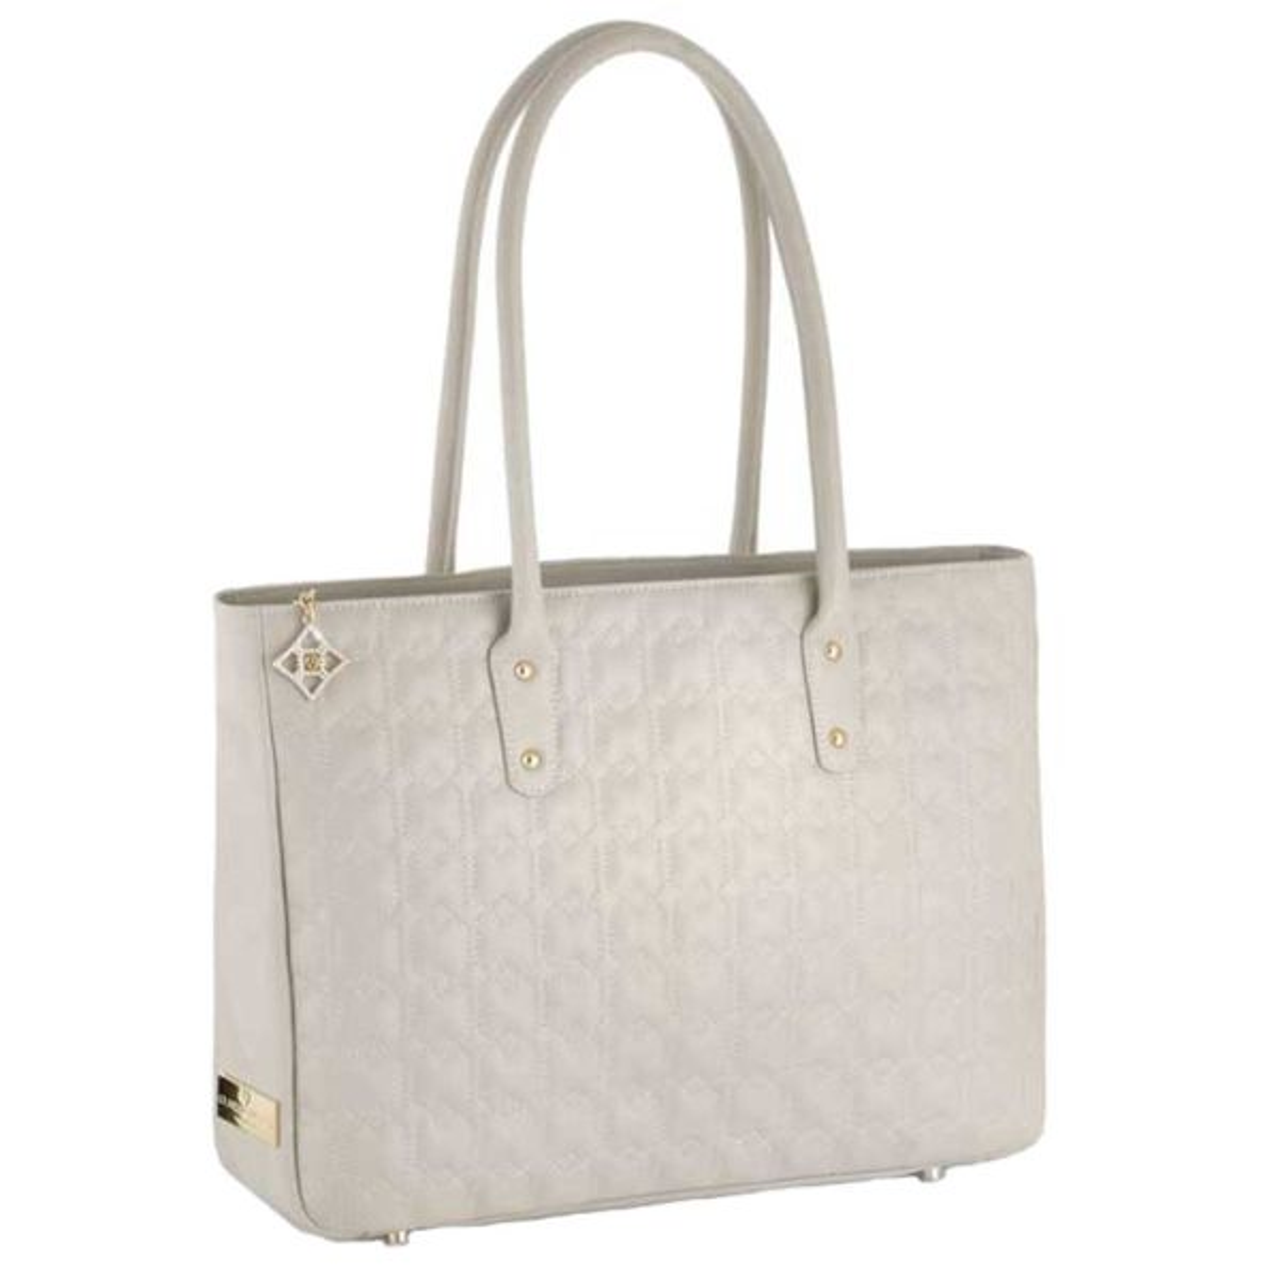 کیف دستی چرم الیوروبر مدل مدوس کد 71060